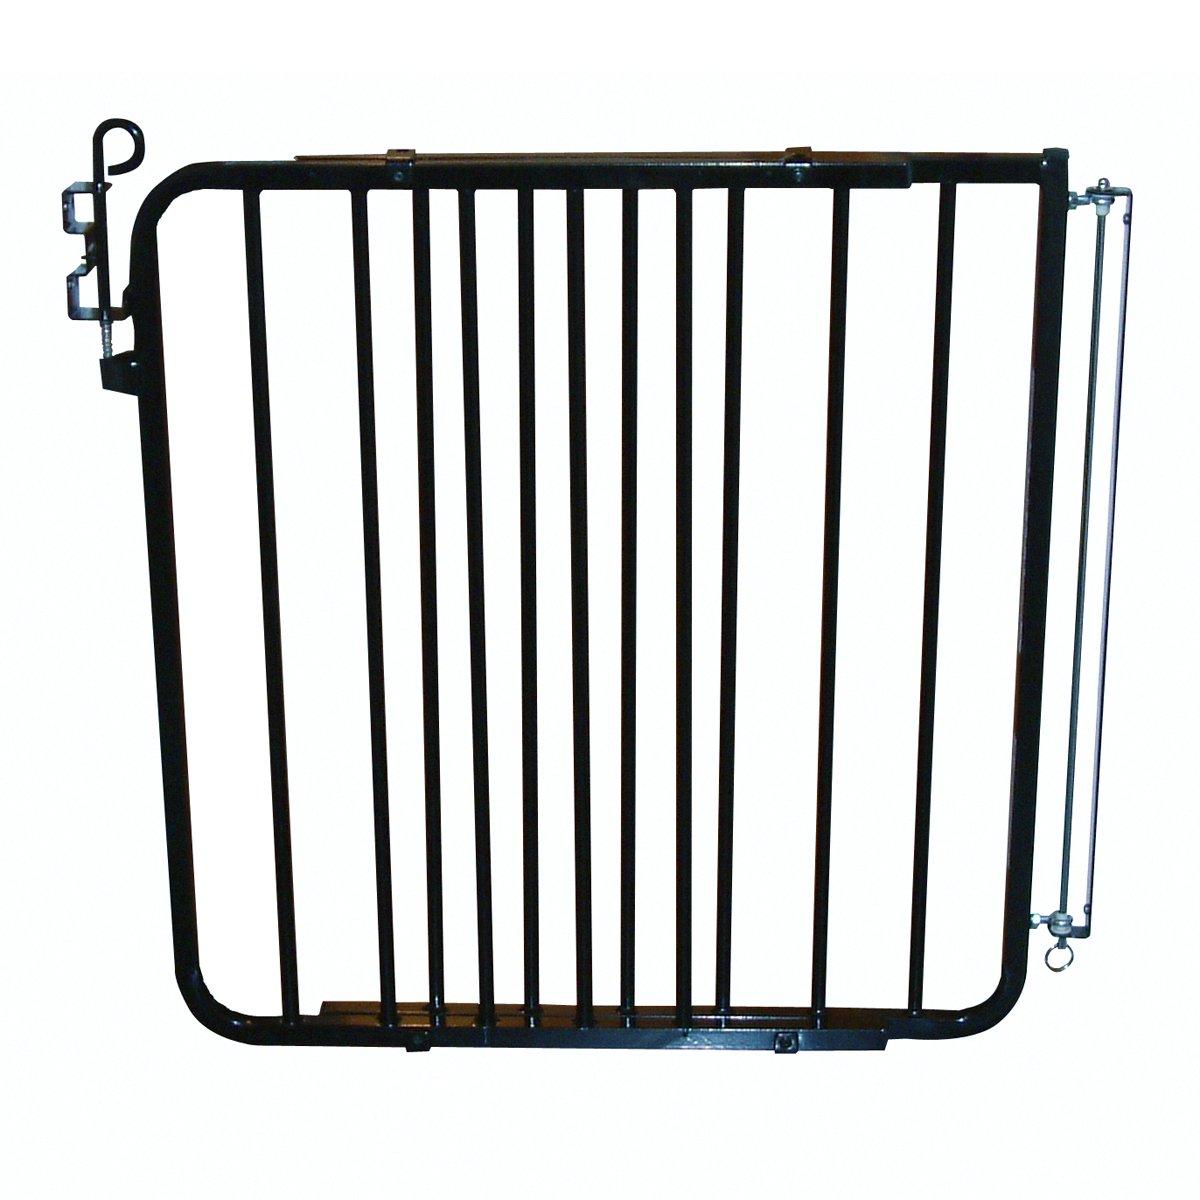 Cardinal Gates Auto-Lock Gate, Black